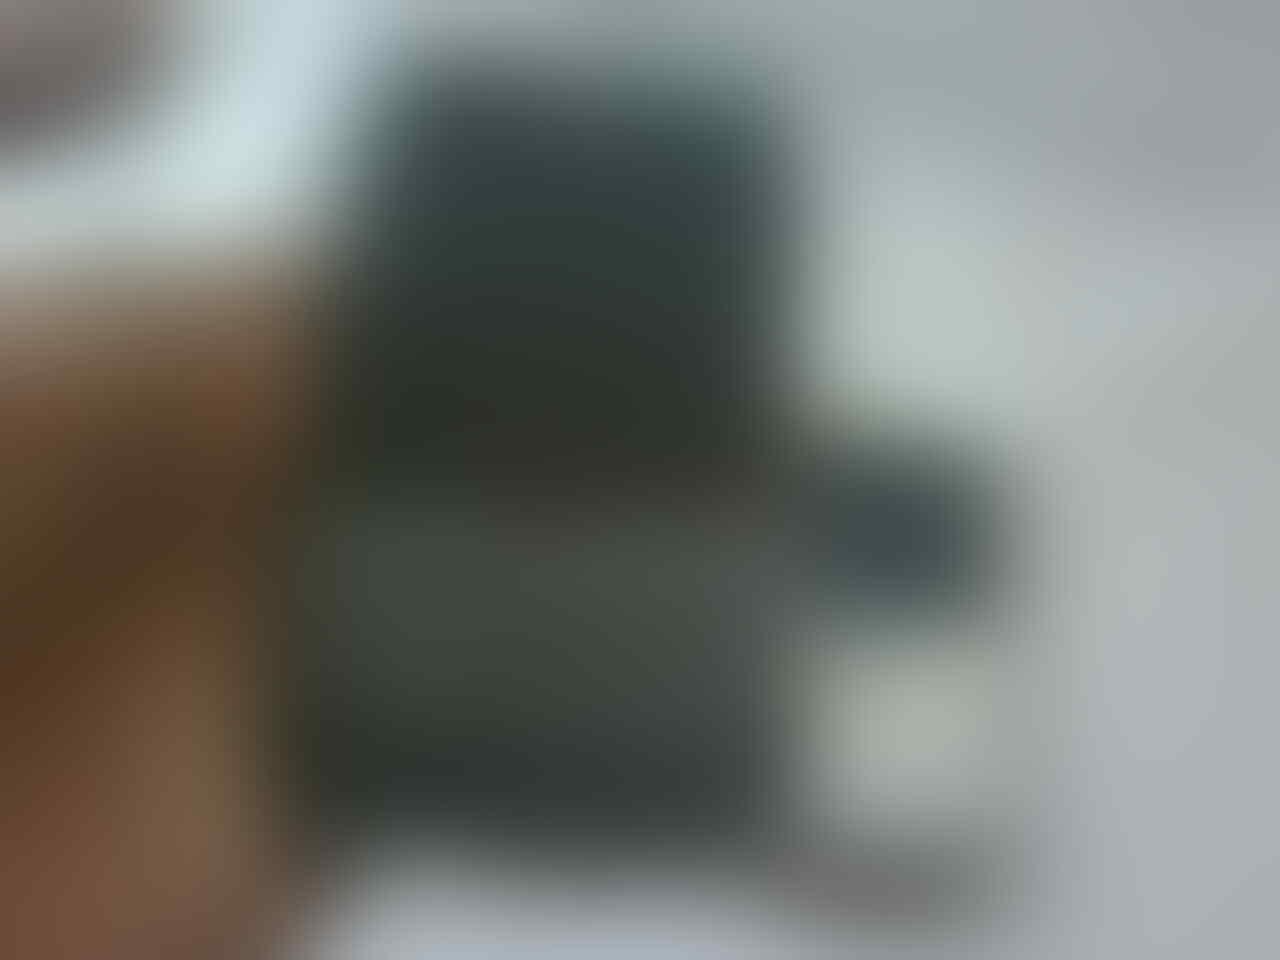 BLACKBERRY ONYX1 9700 HITAM LENGKAP MULUS